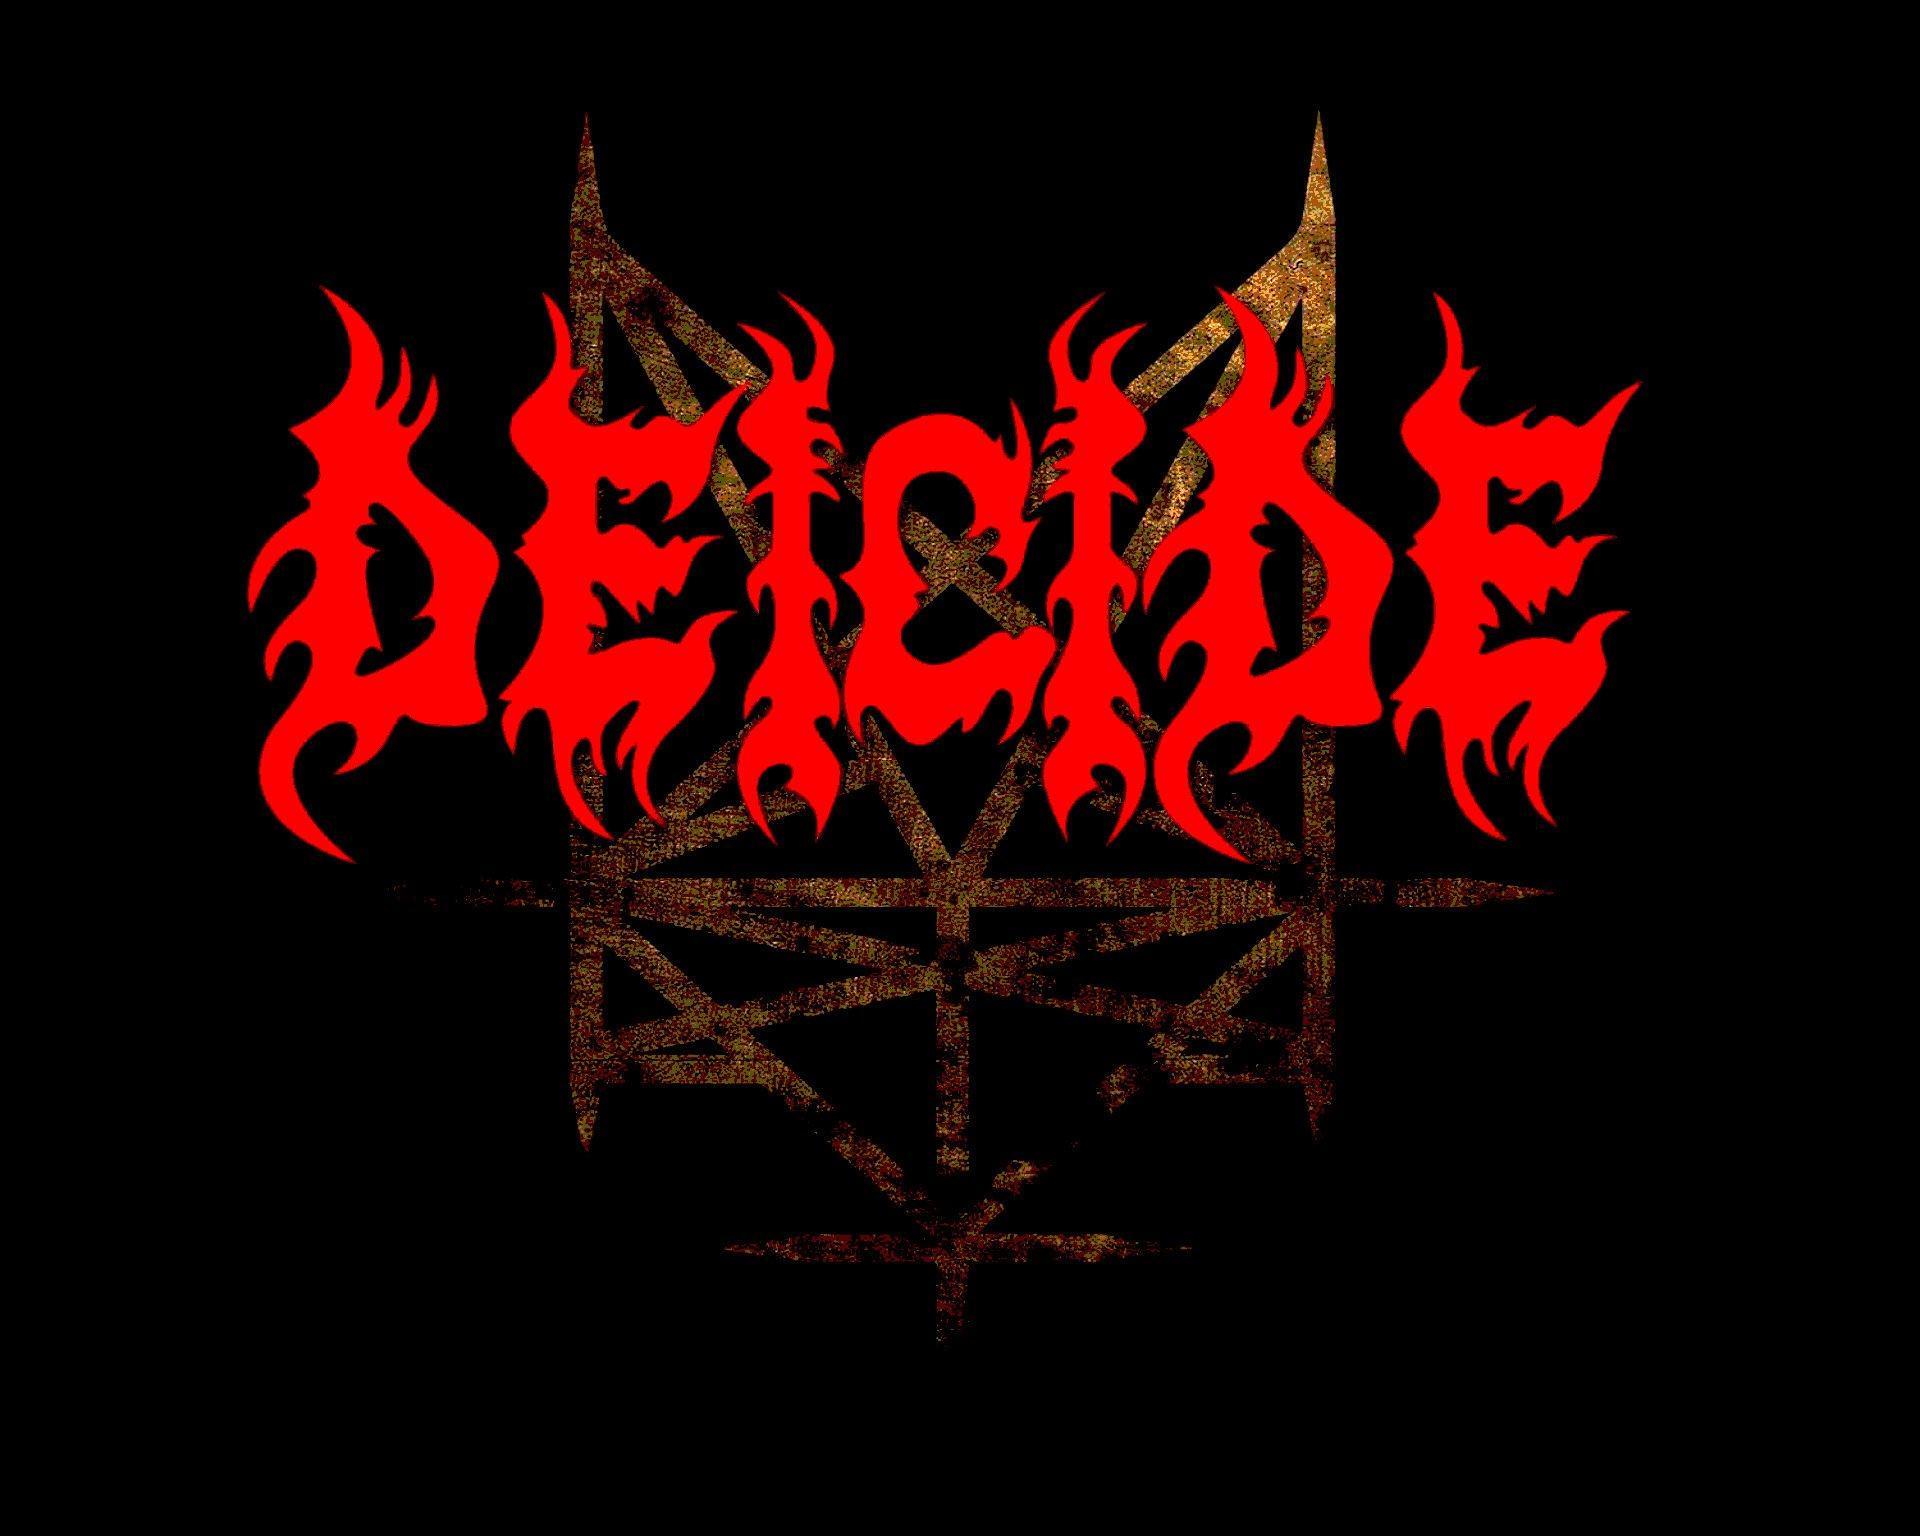 deicide death metal heavy satanic wallpaper 1920x1536 634371